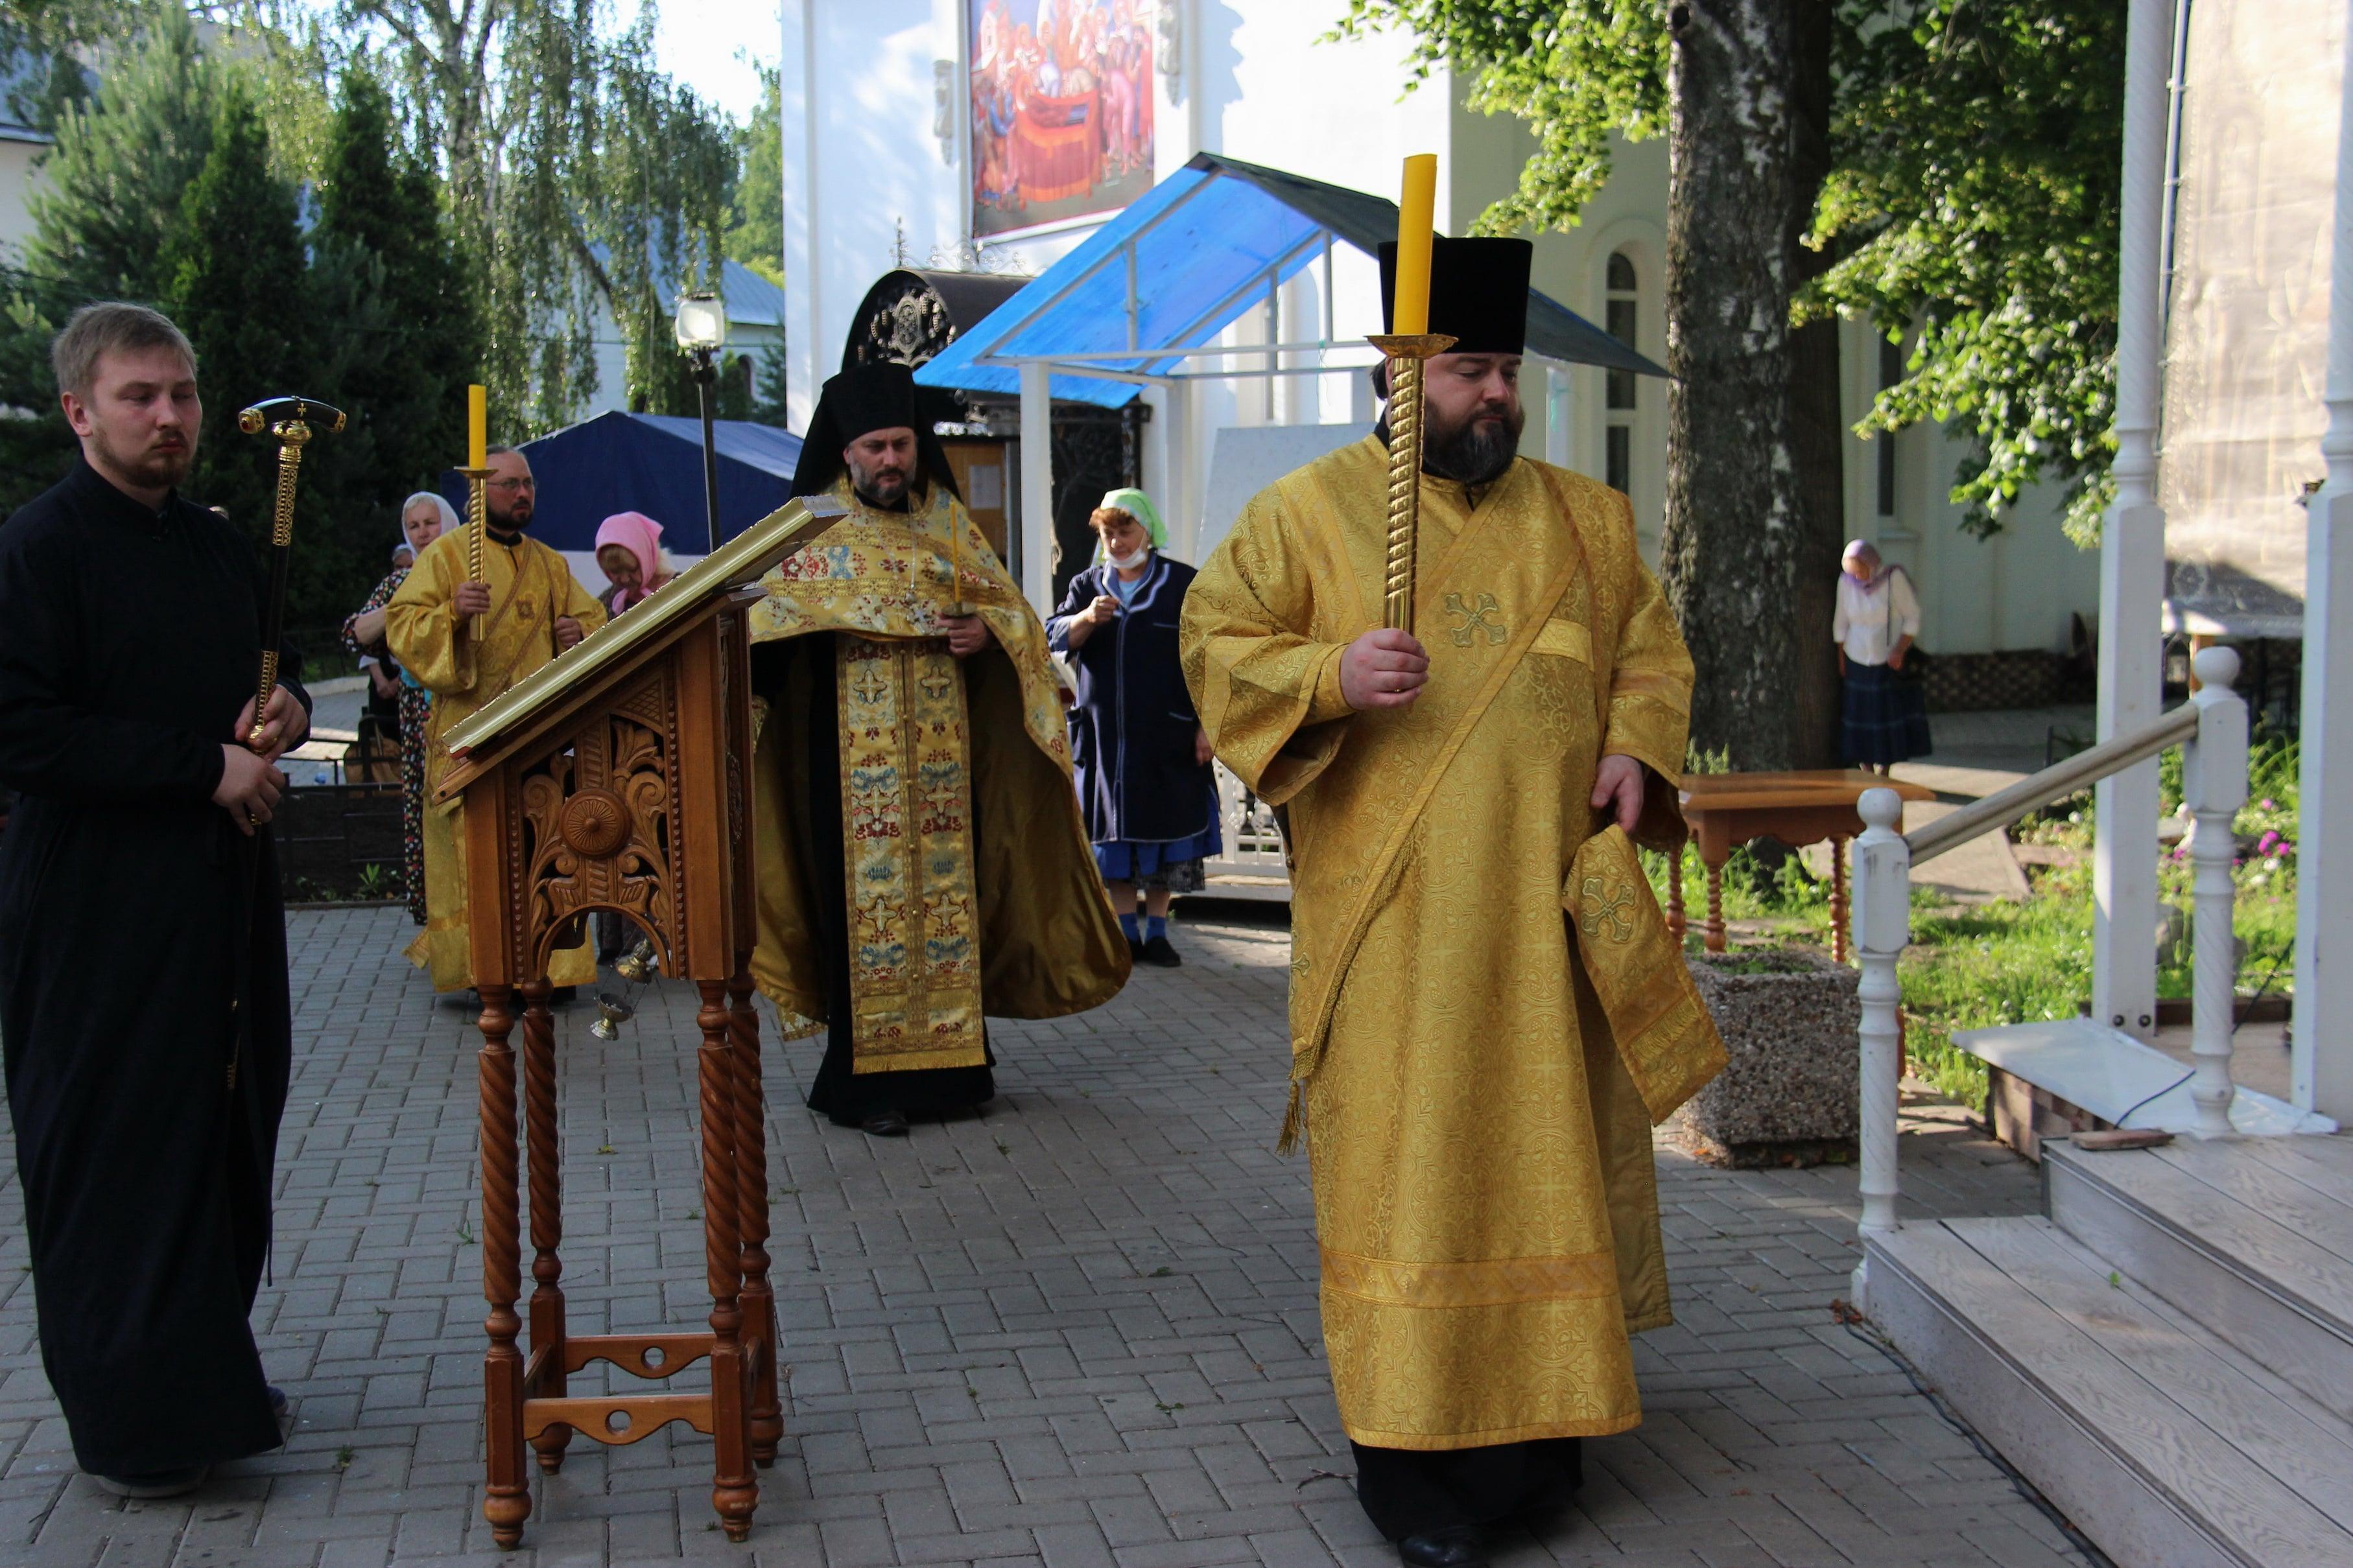 http://monuspen.ru/photoreports/9d553e3cea426a8390cd62a5f8fa5g08.JPG